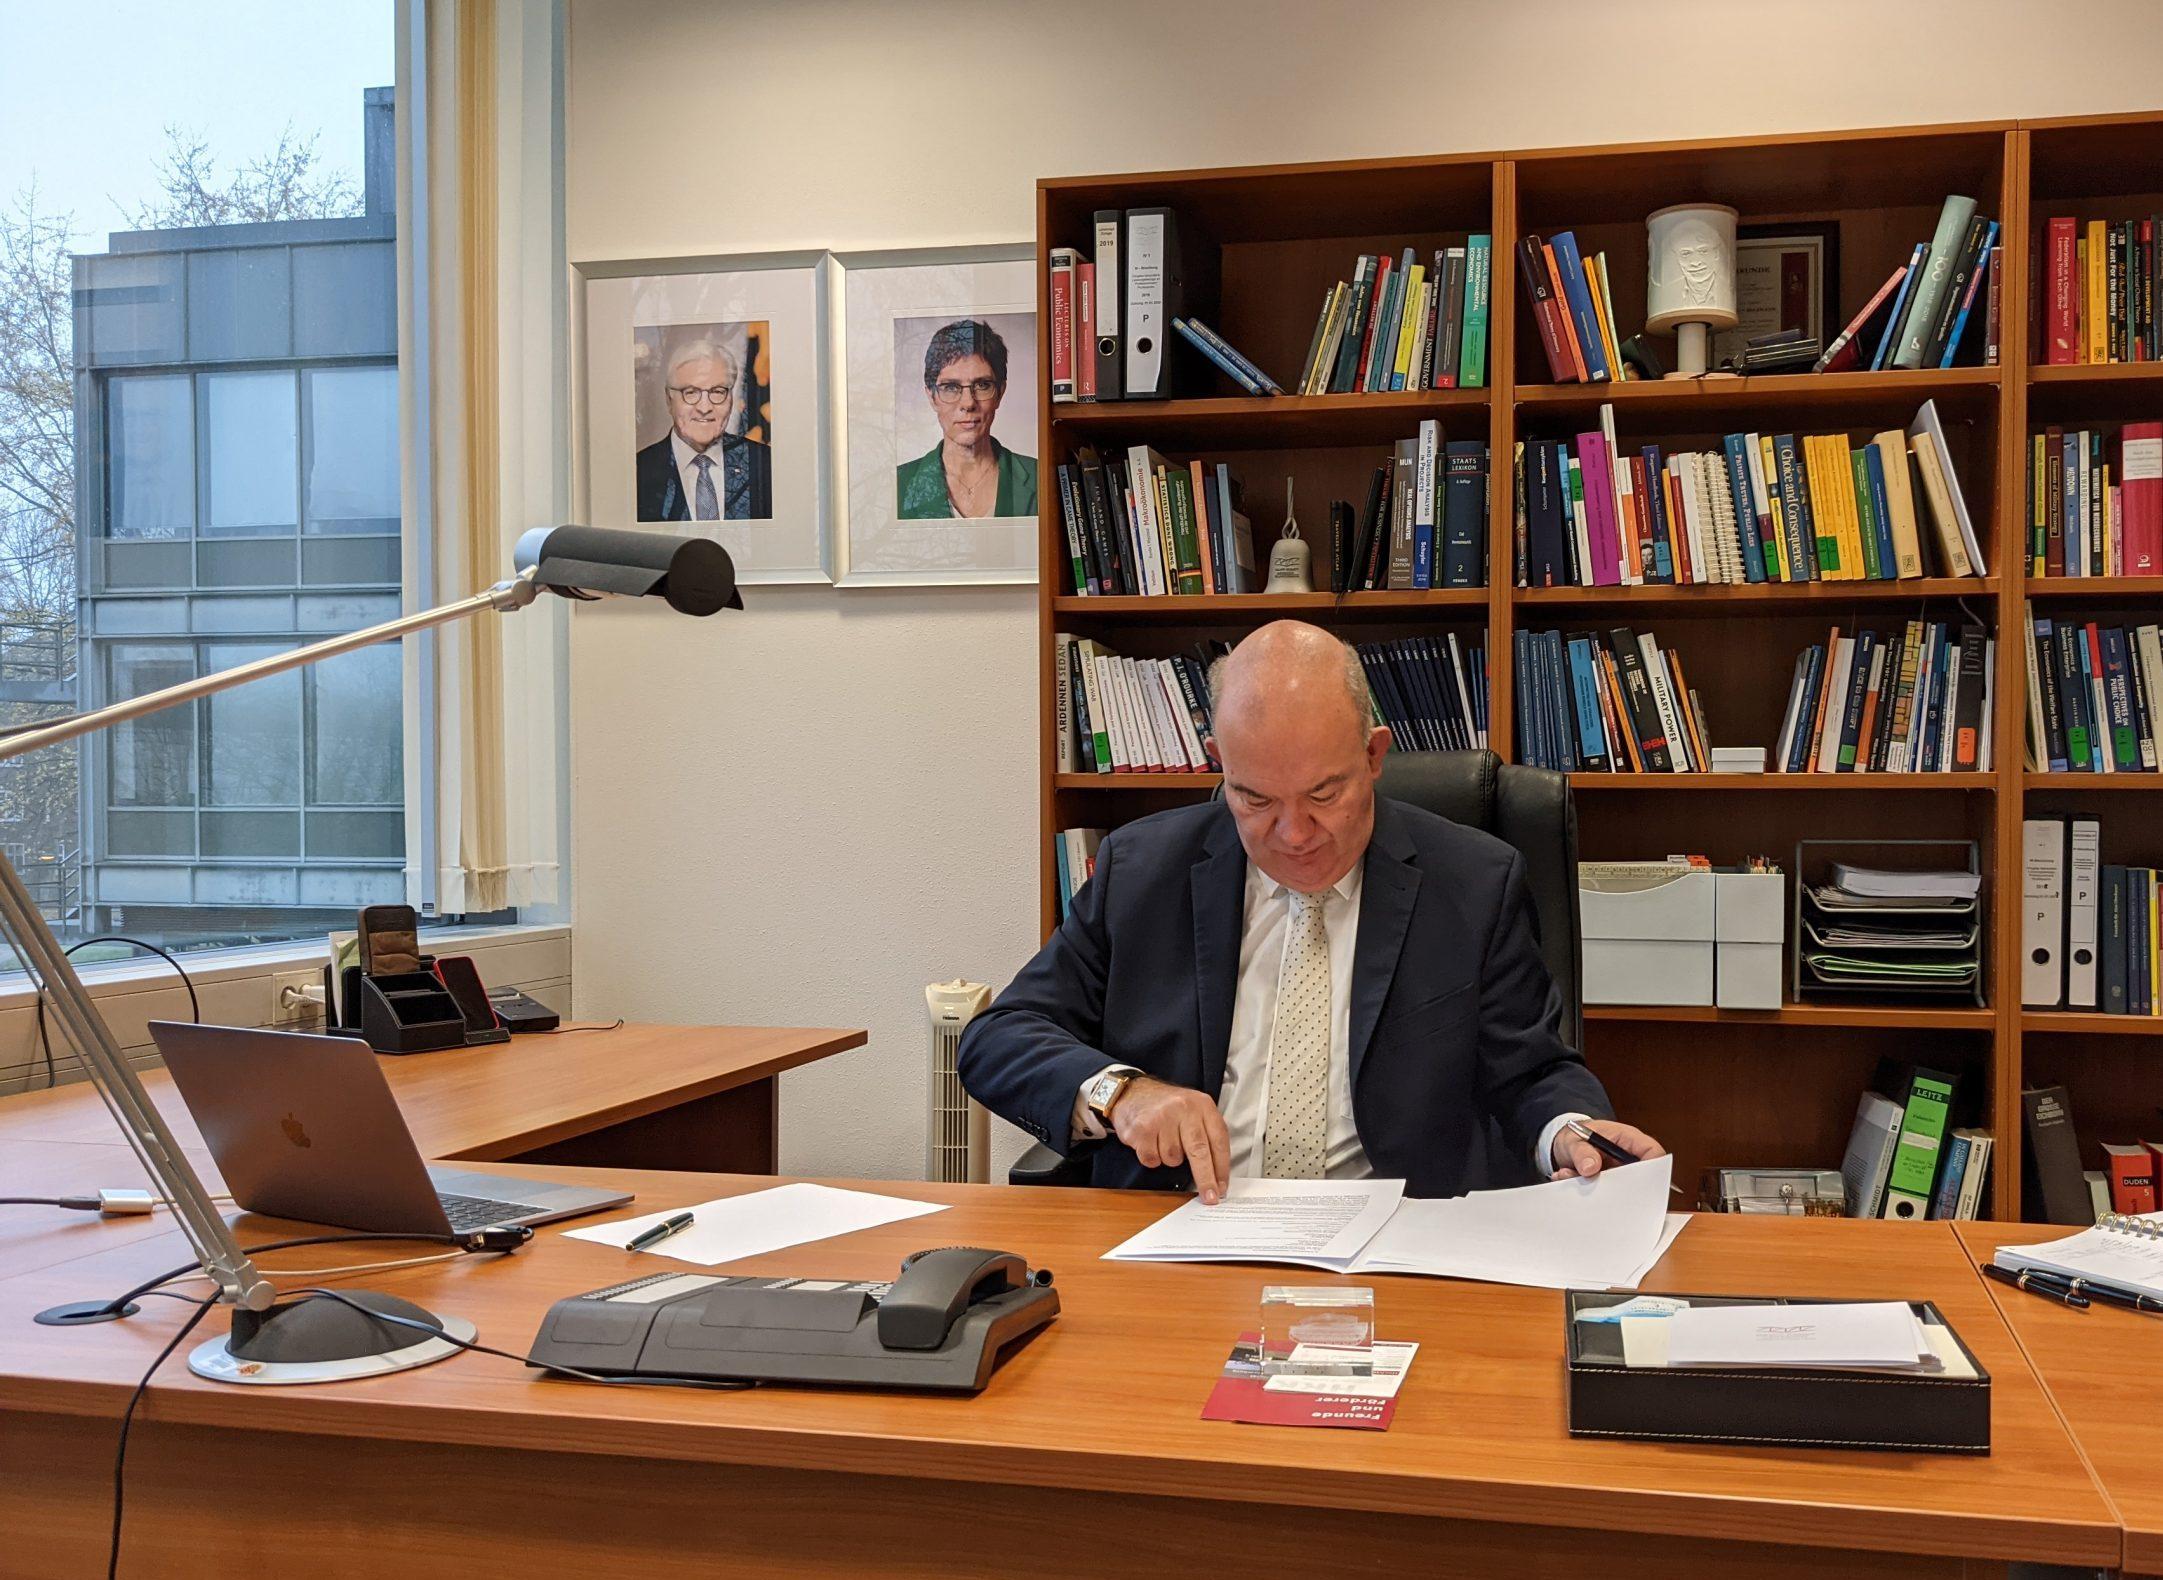 Helmut Schmidt Universität Bibliothek